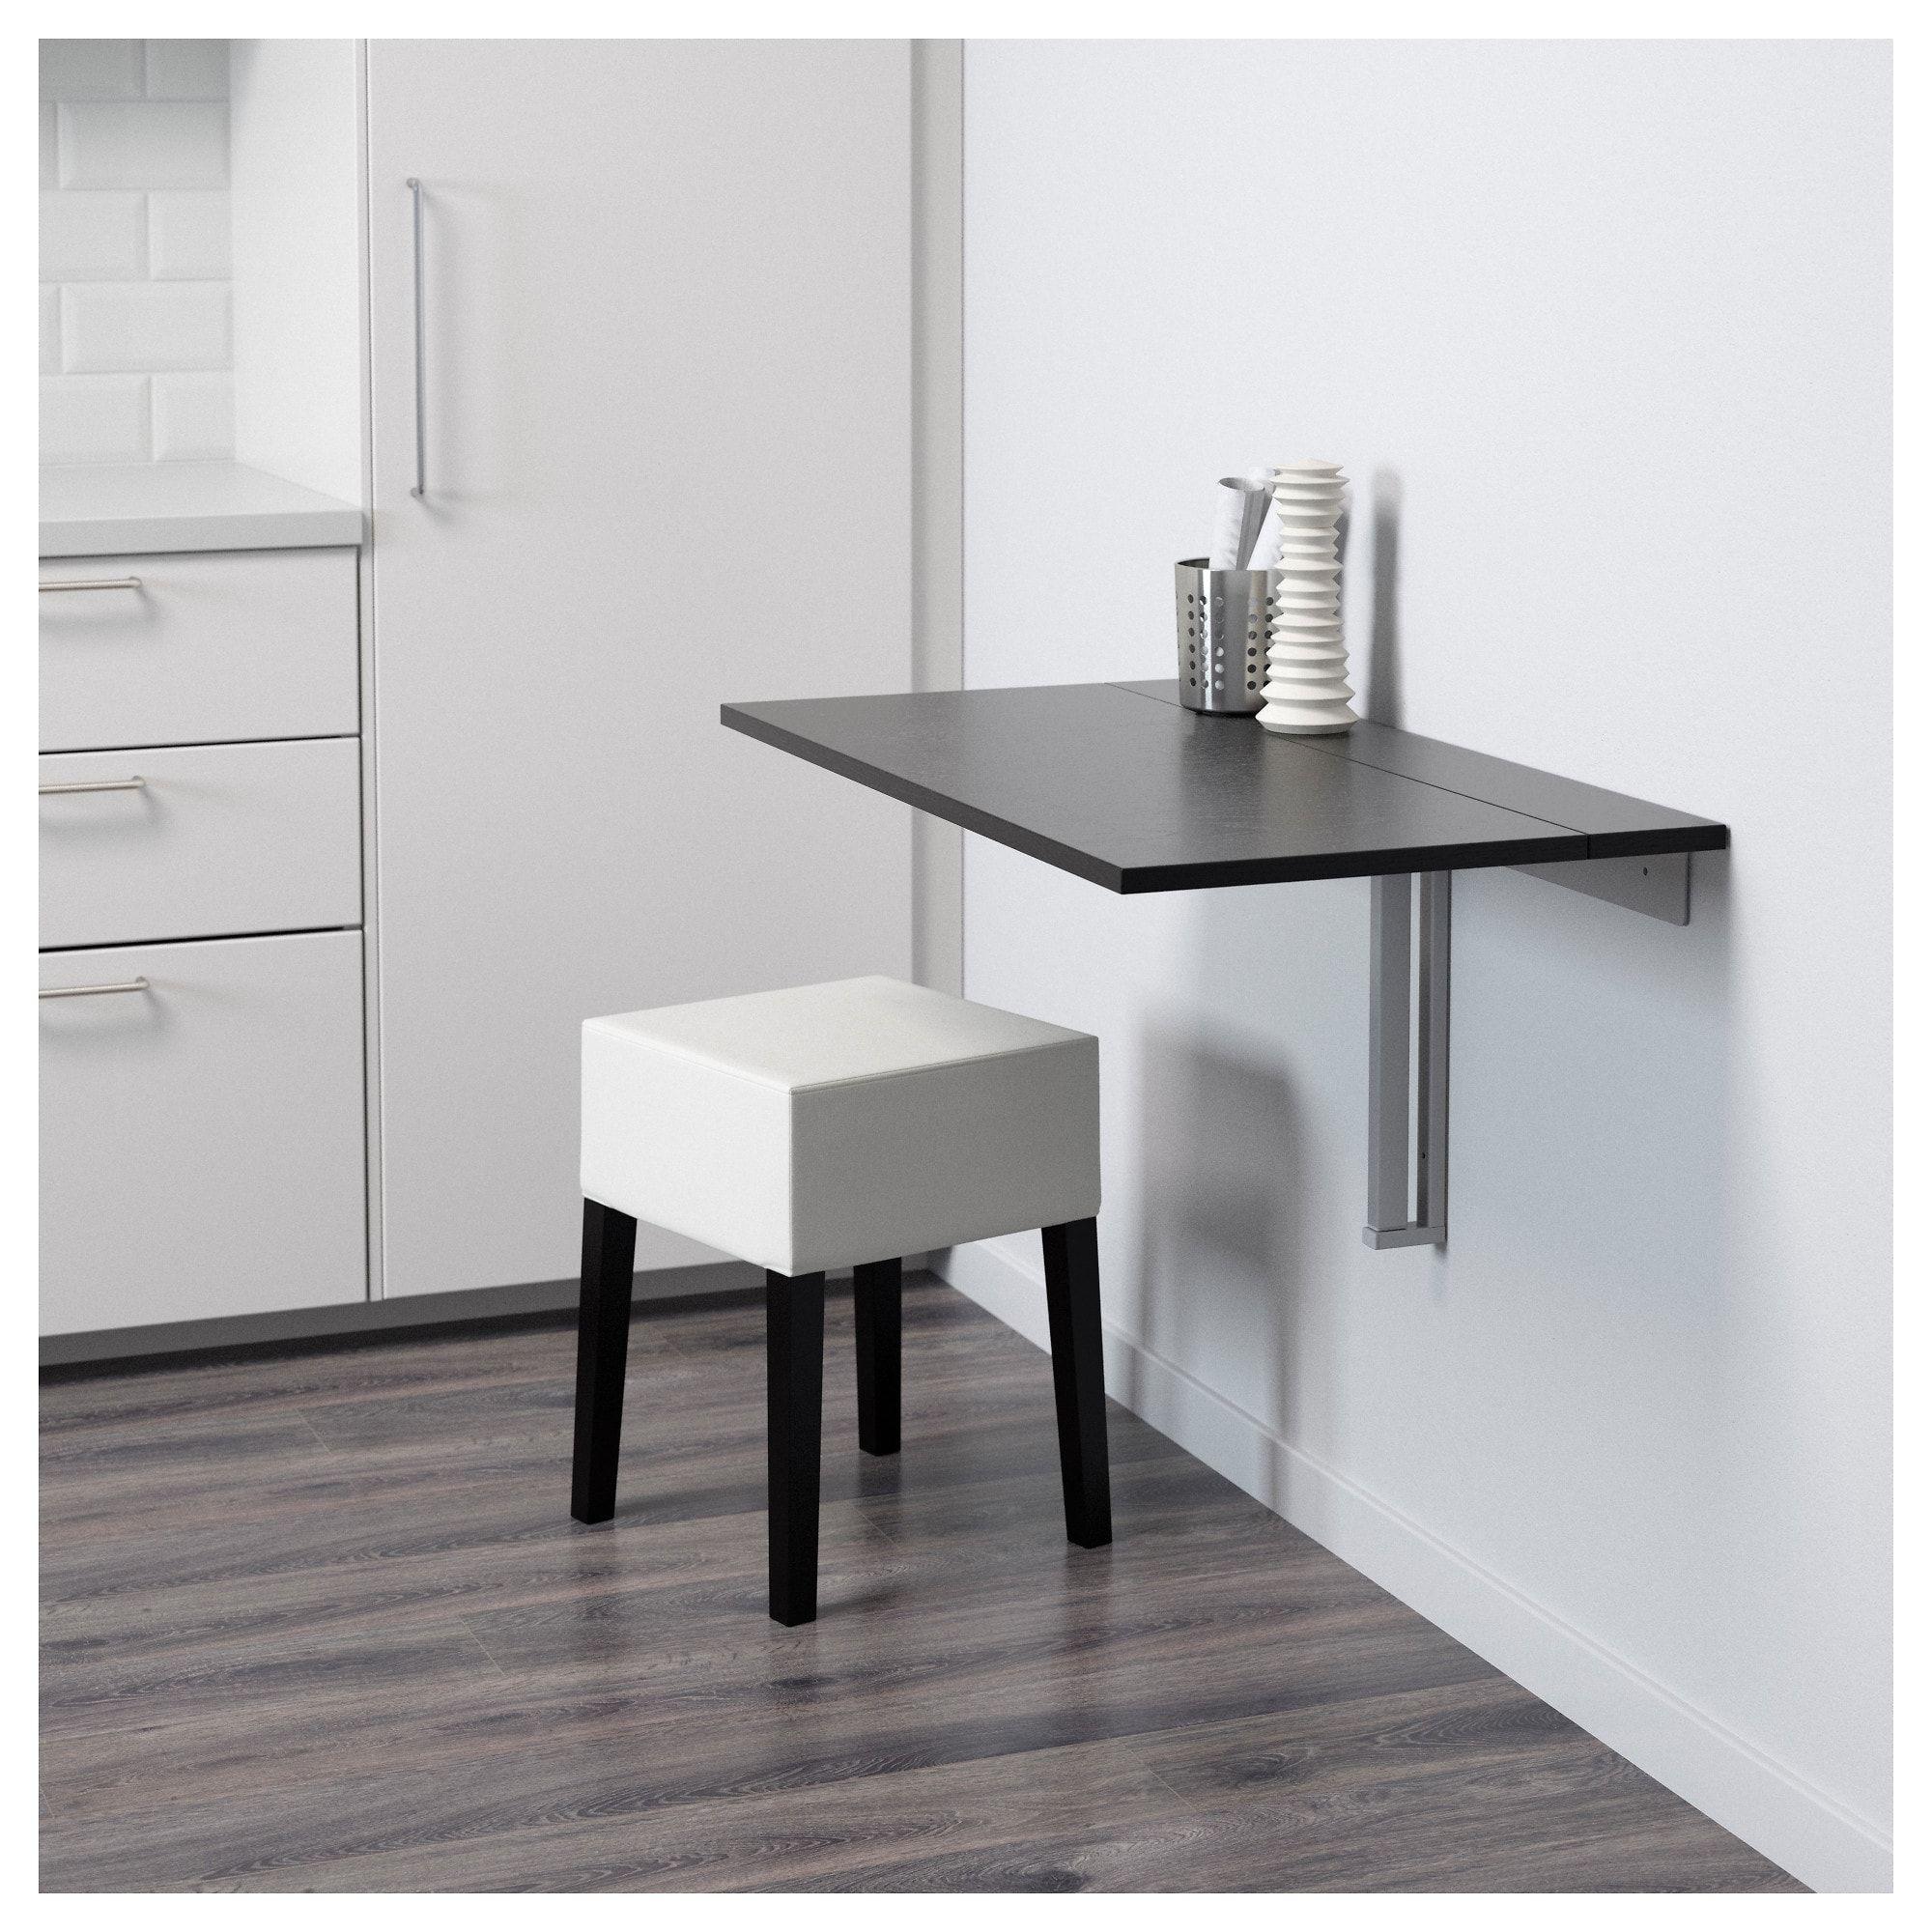 bjursta nils table set